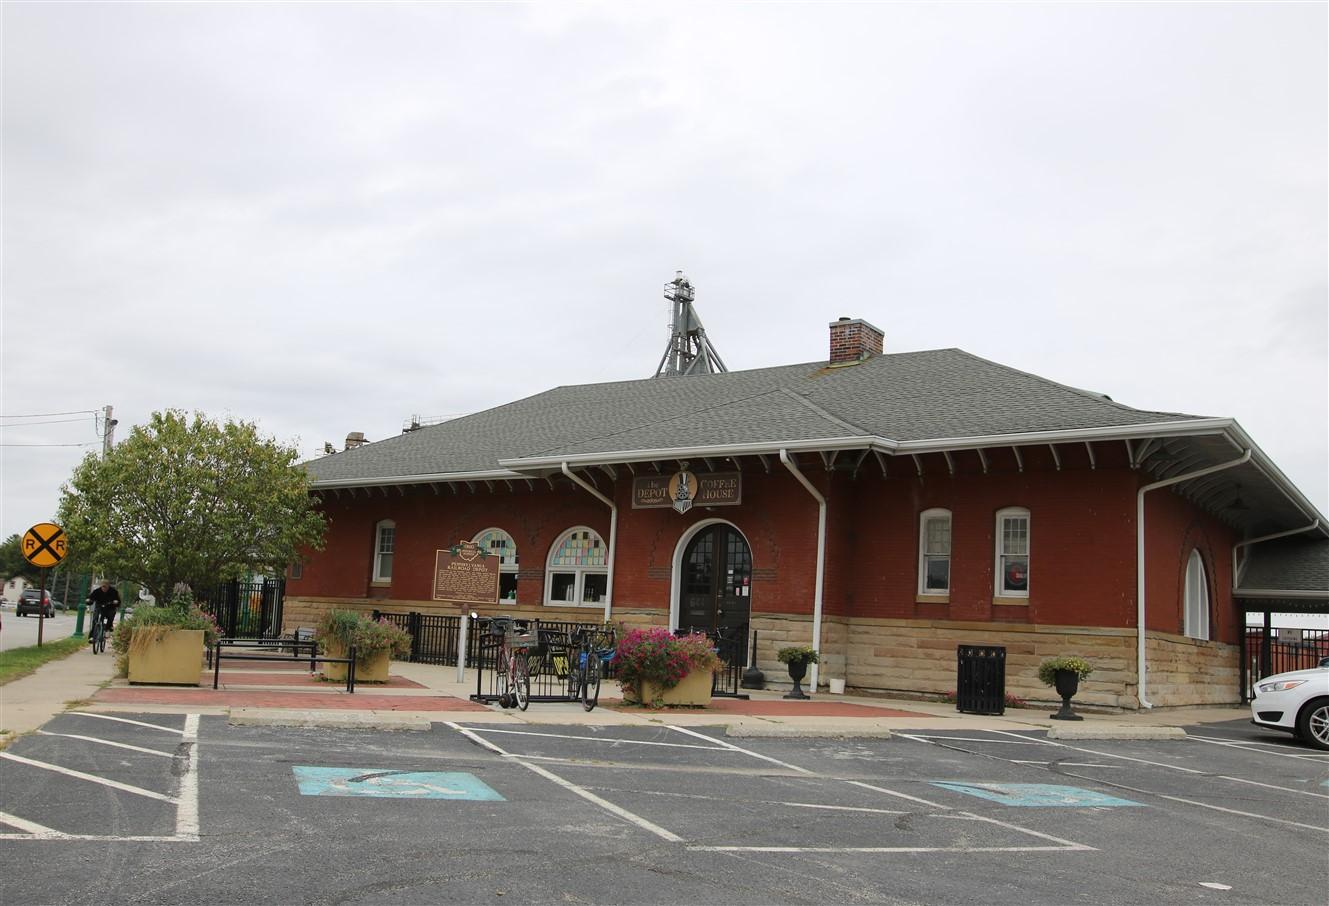 2018 09 22 335 Urbana OH Train Depots.jpg